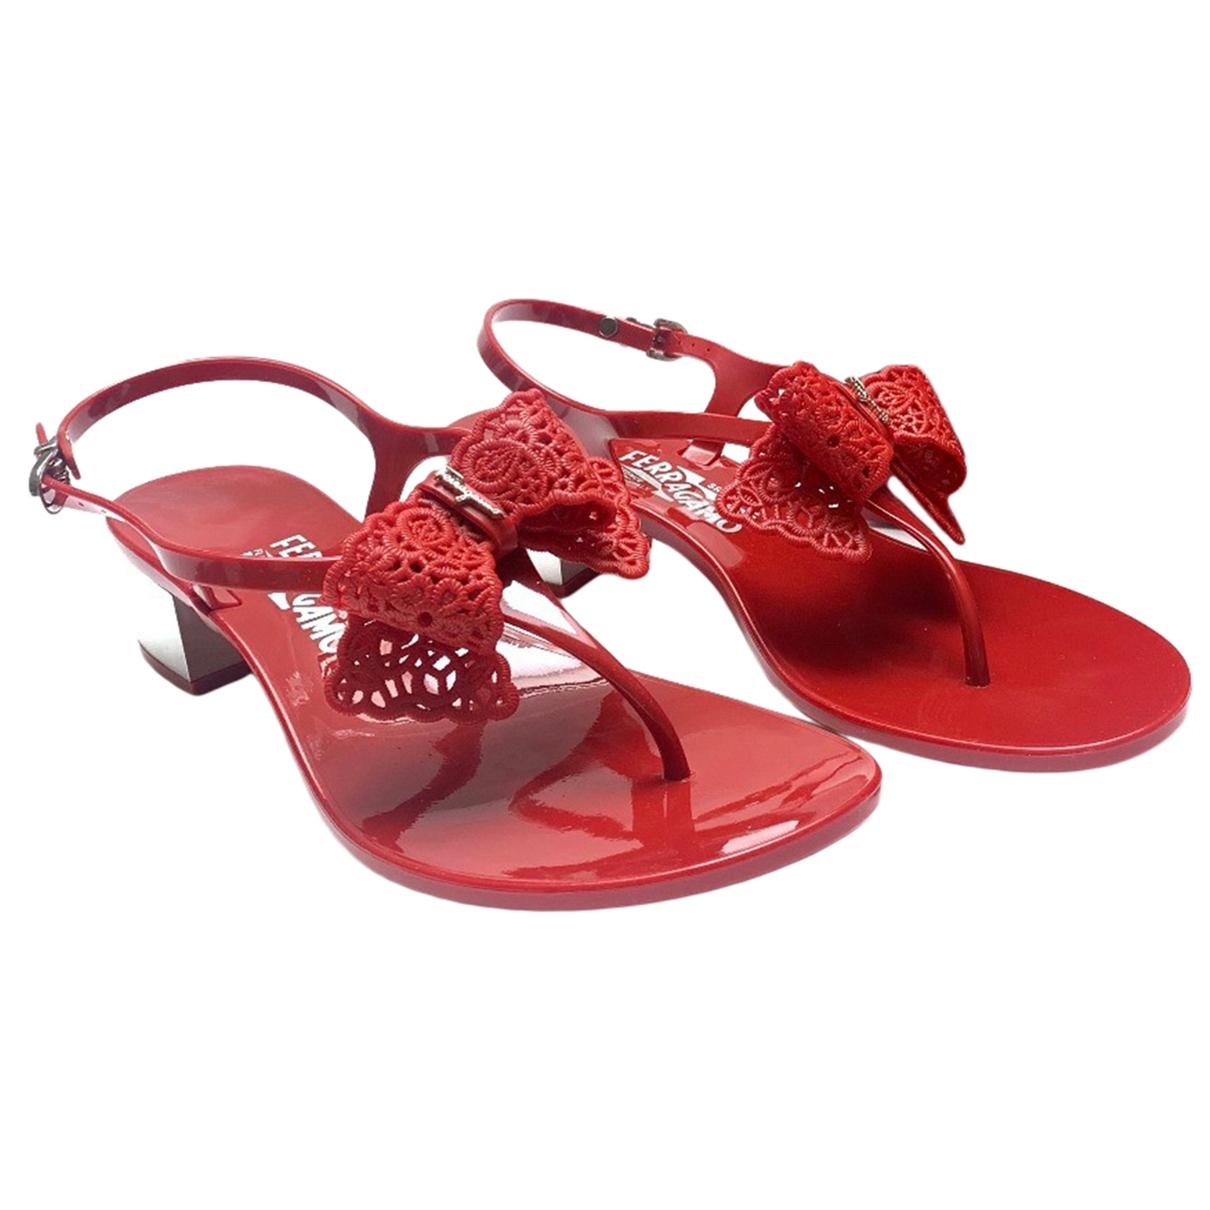 Salvatore Ferragamo \N Red Rubber Sandals for Women 9 US